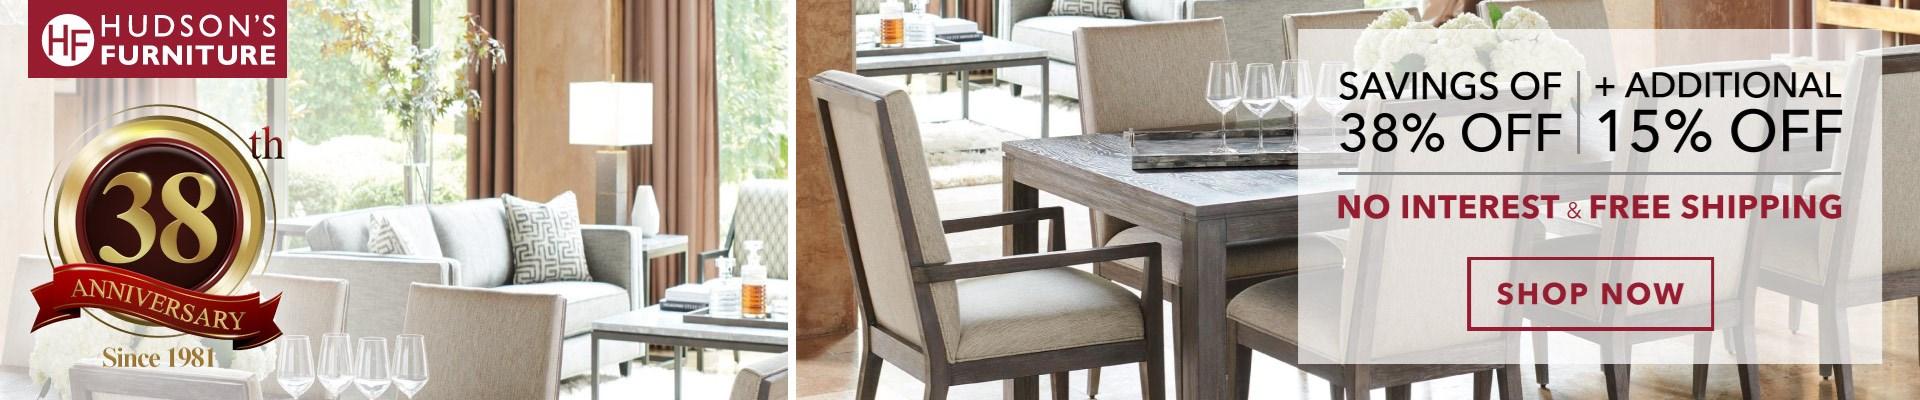 Hudson's Furniture Anniversary Sale